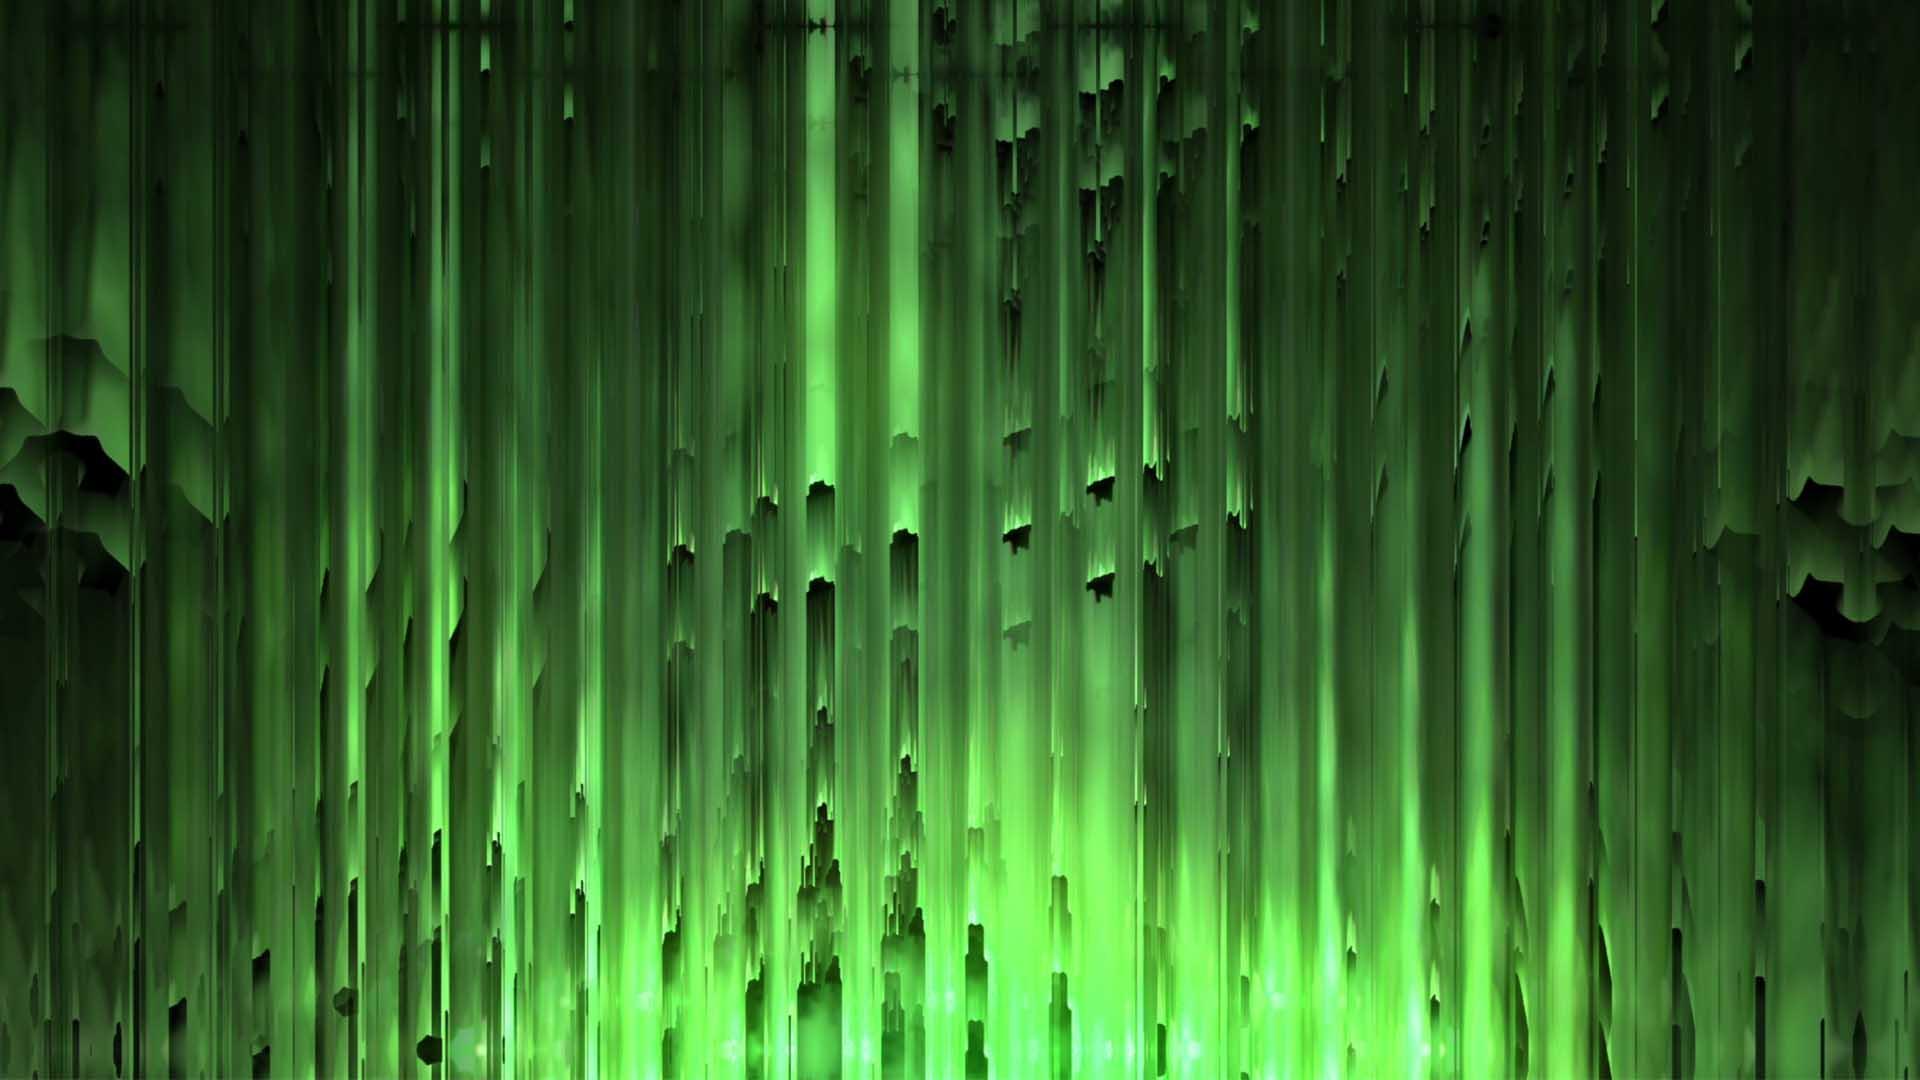 HD_Motion_Background_Video_texture_Vj_Loop